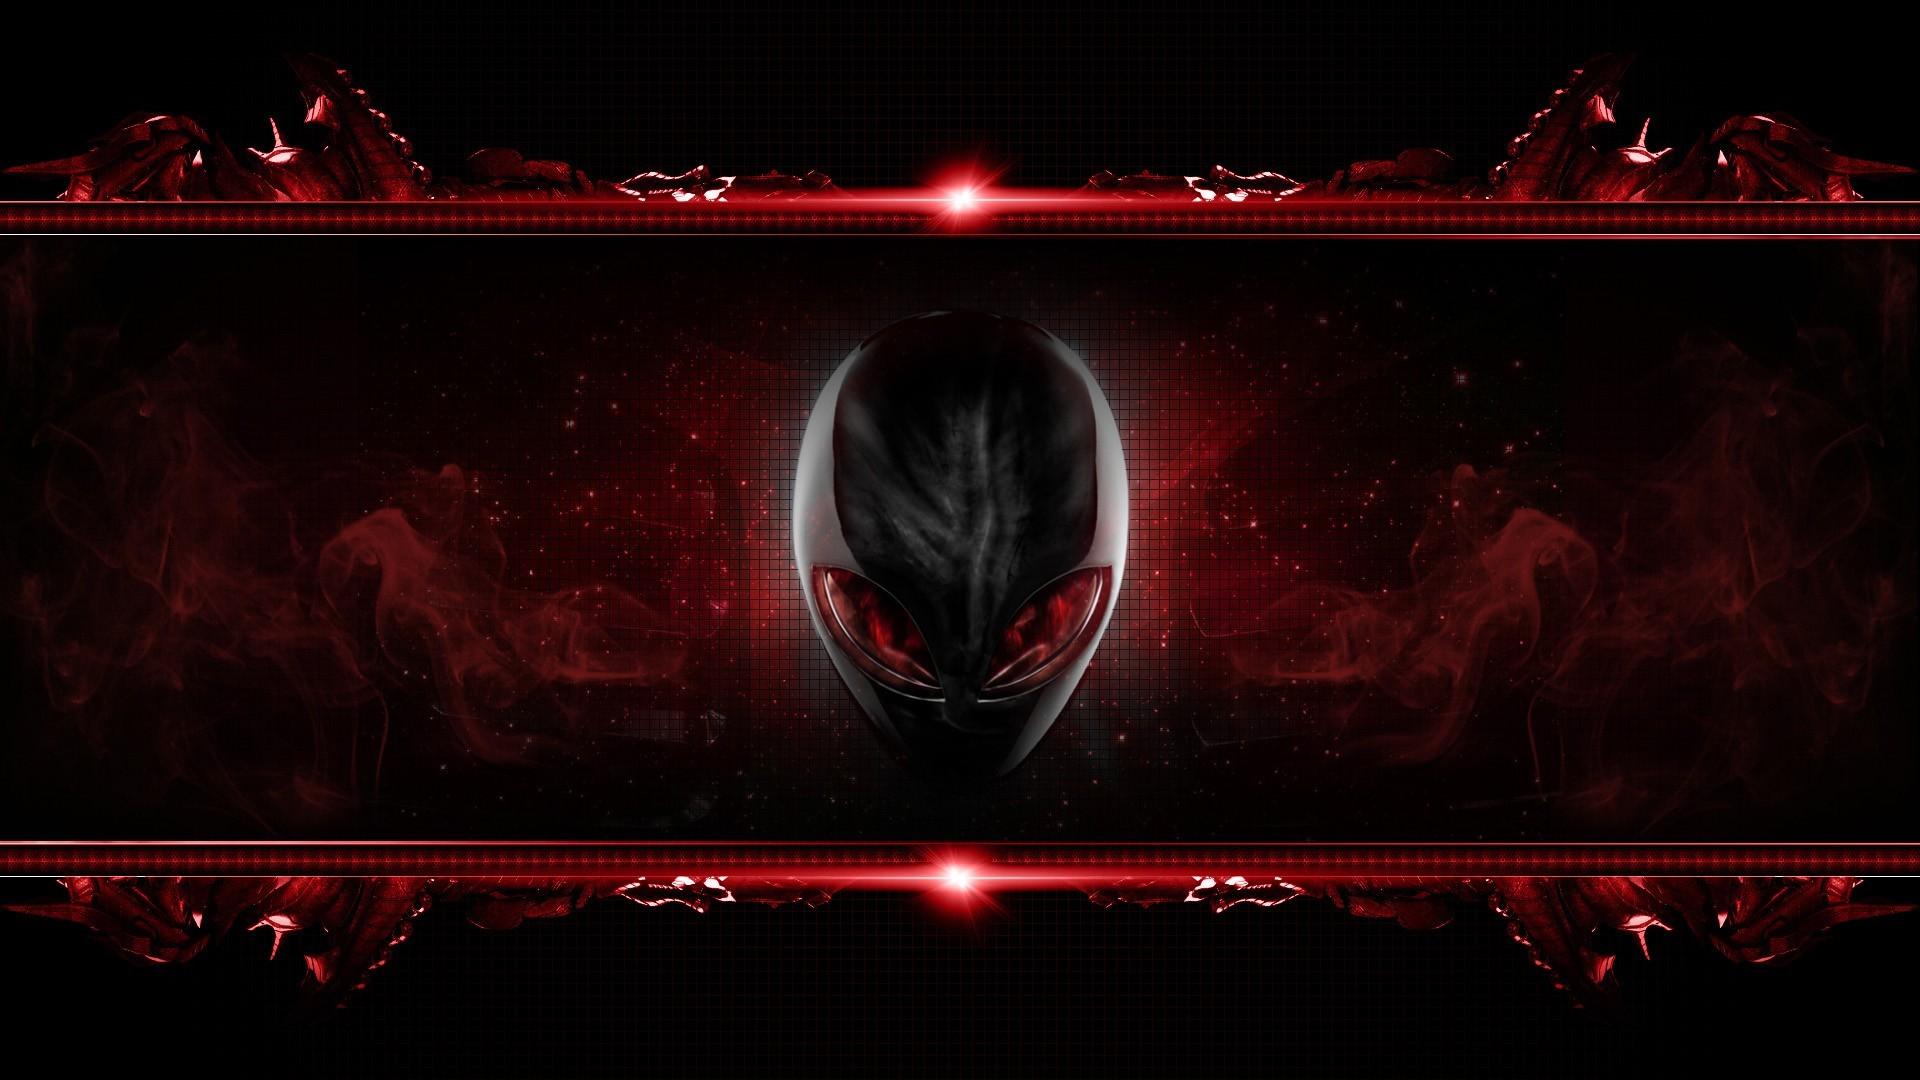 alienware-red-hd-wallpaper